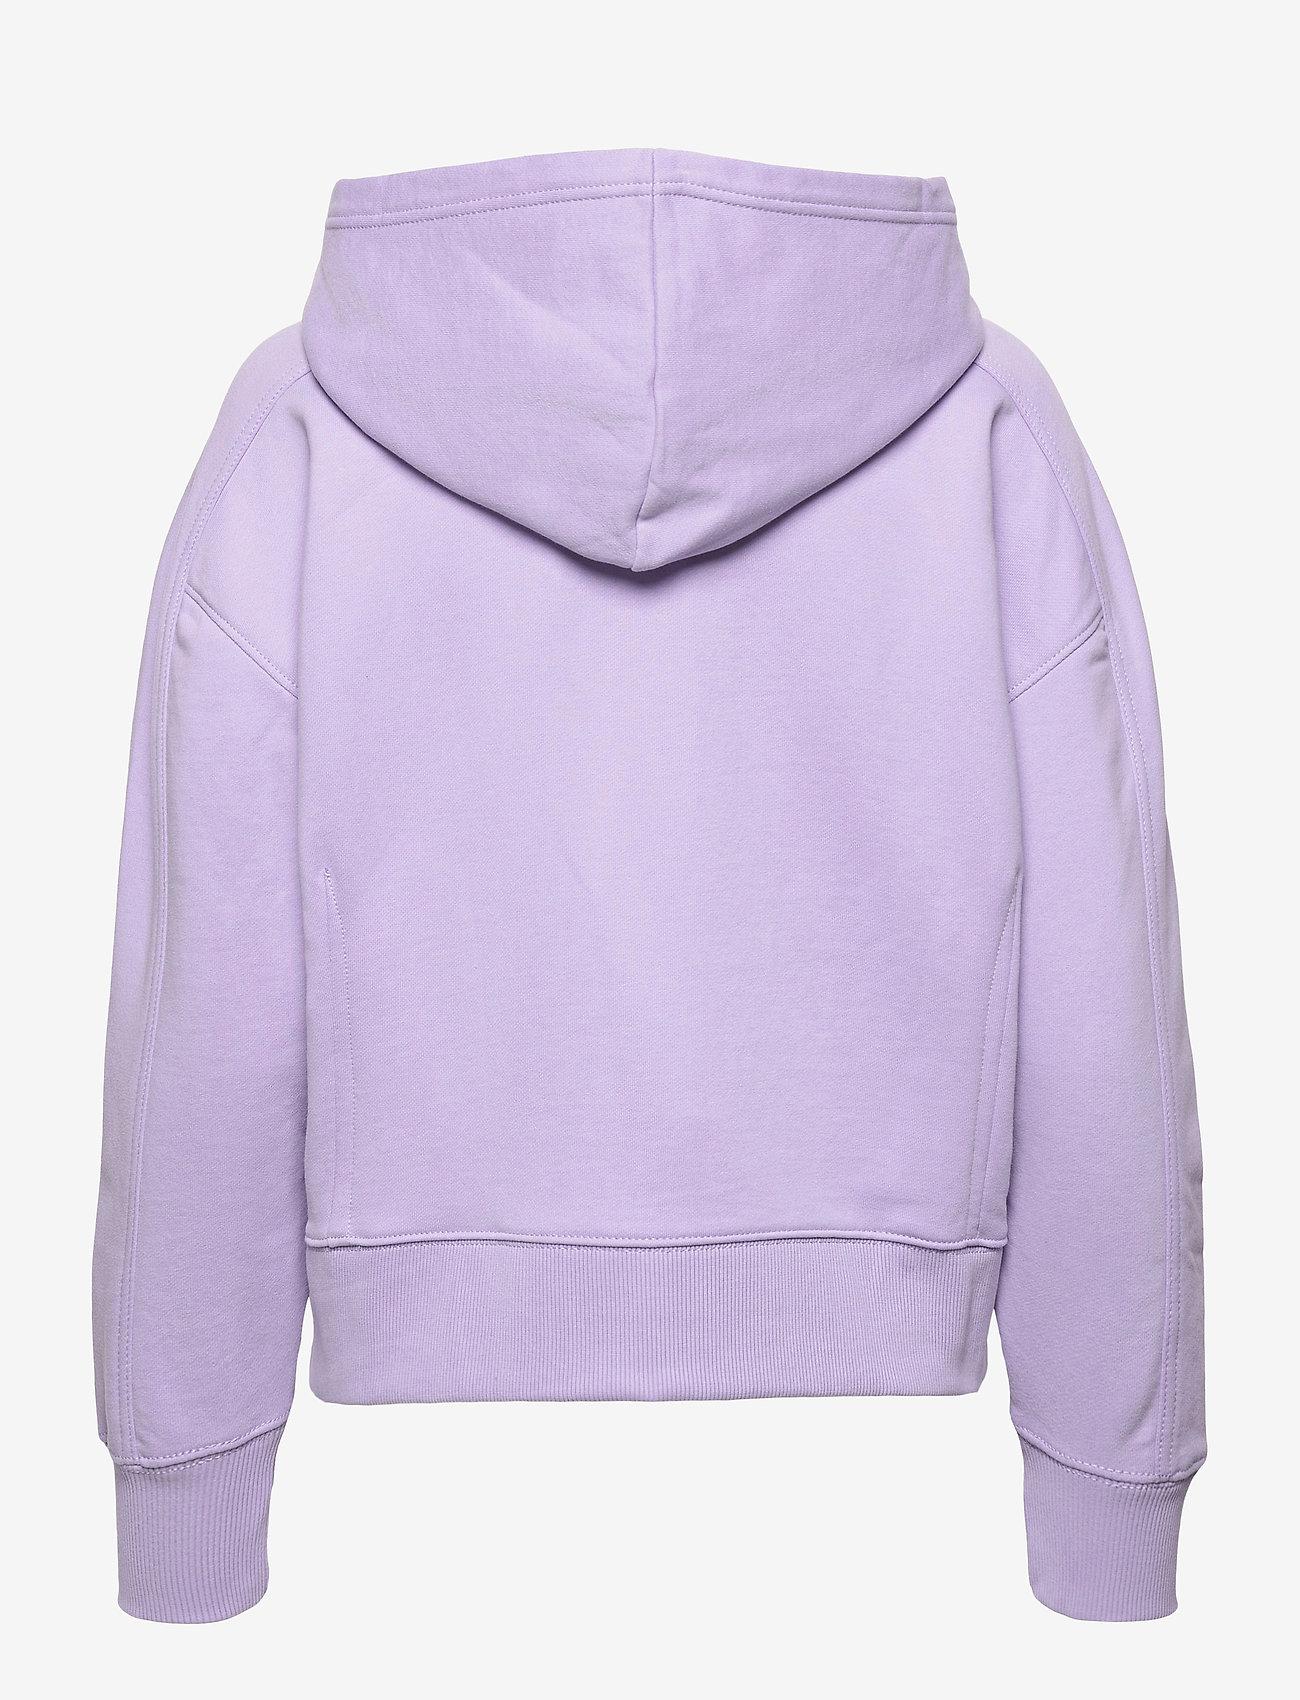 Calvin Klein Jeans - MICRO BRANDING HOODIE - hettegensere - palma lilac - 1